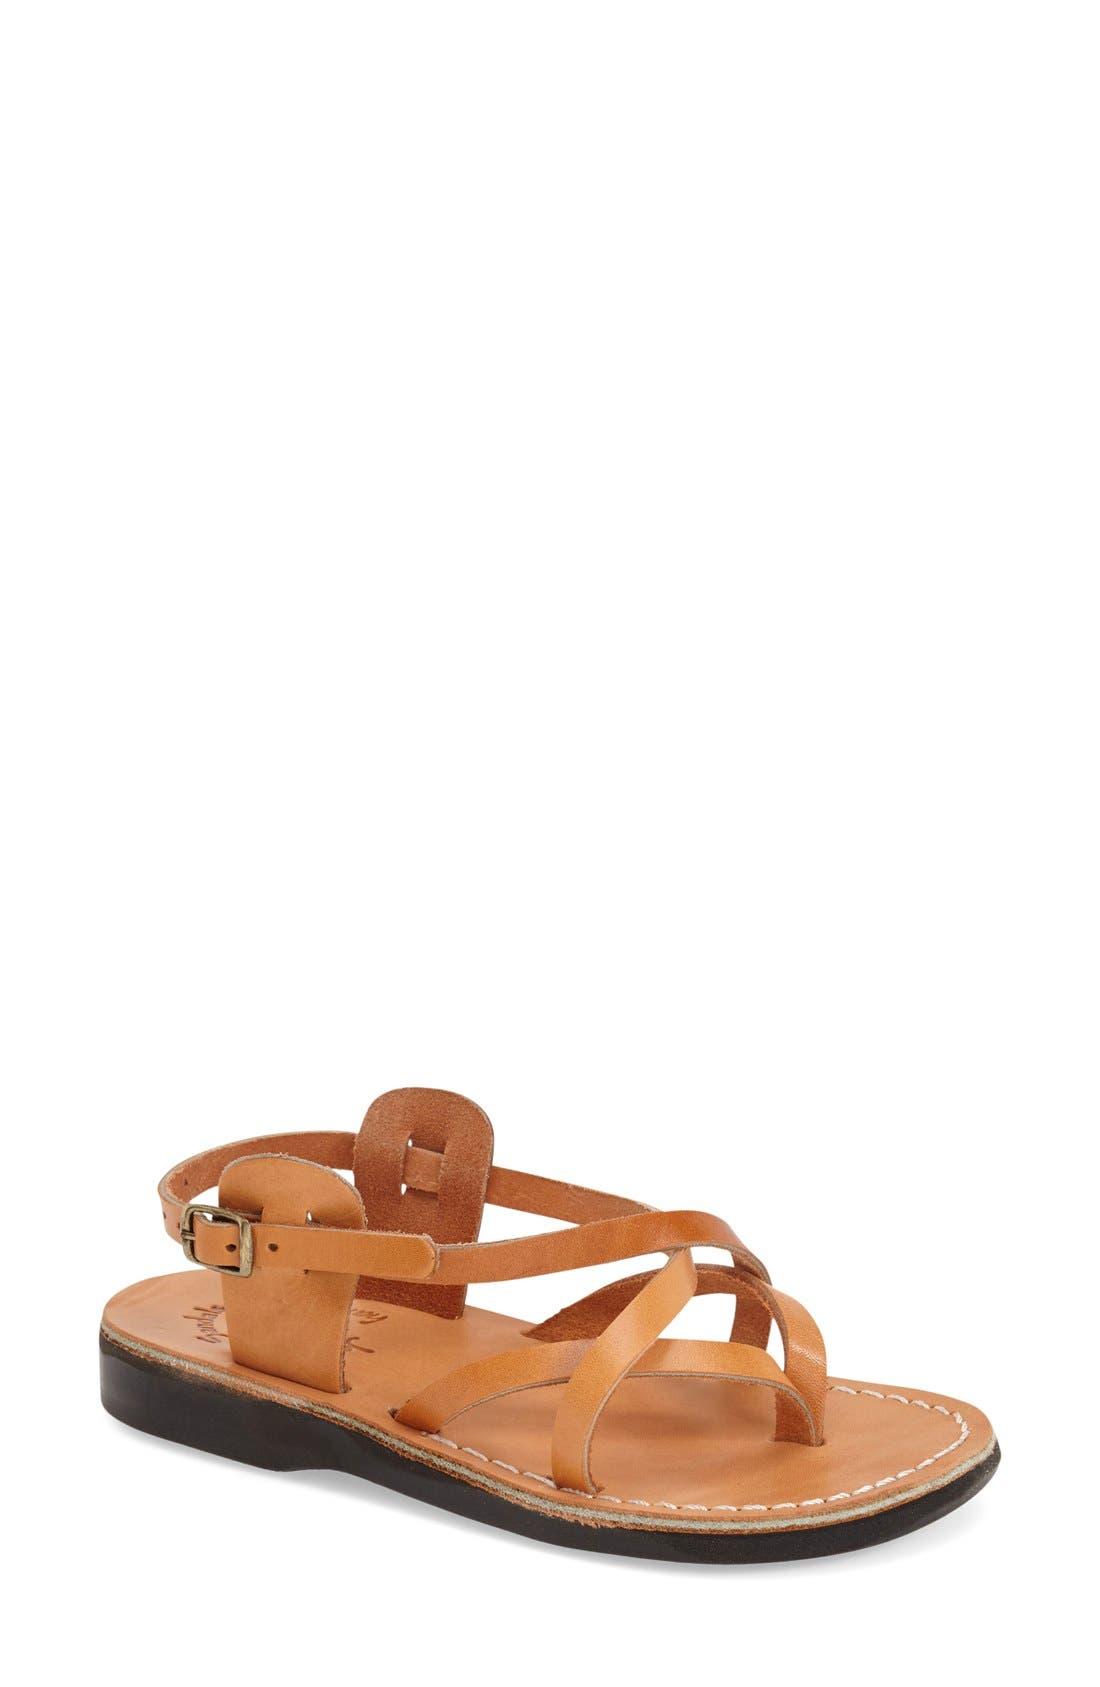 Main Image - Jerusalem Sandals 'Tamar' Strappy Sandal (Women)